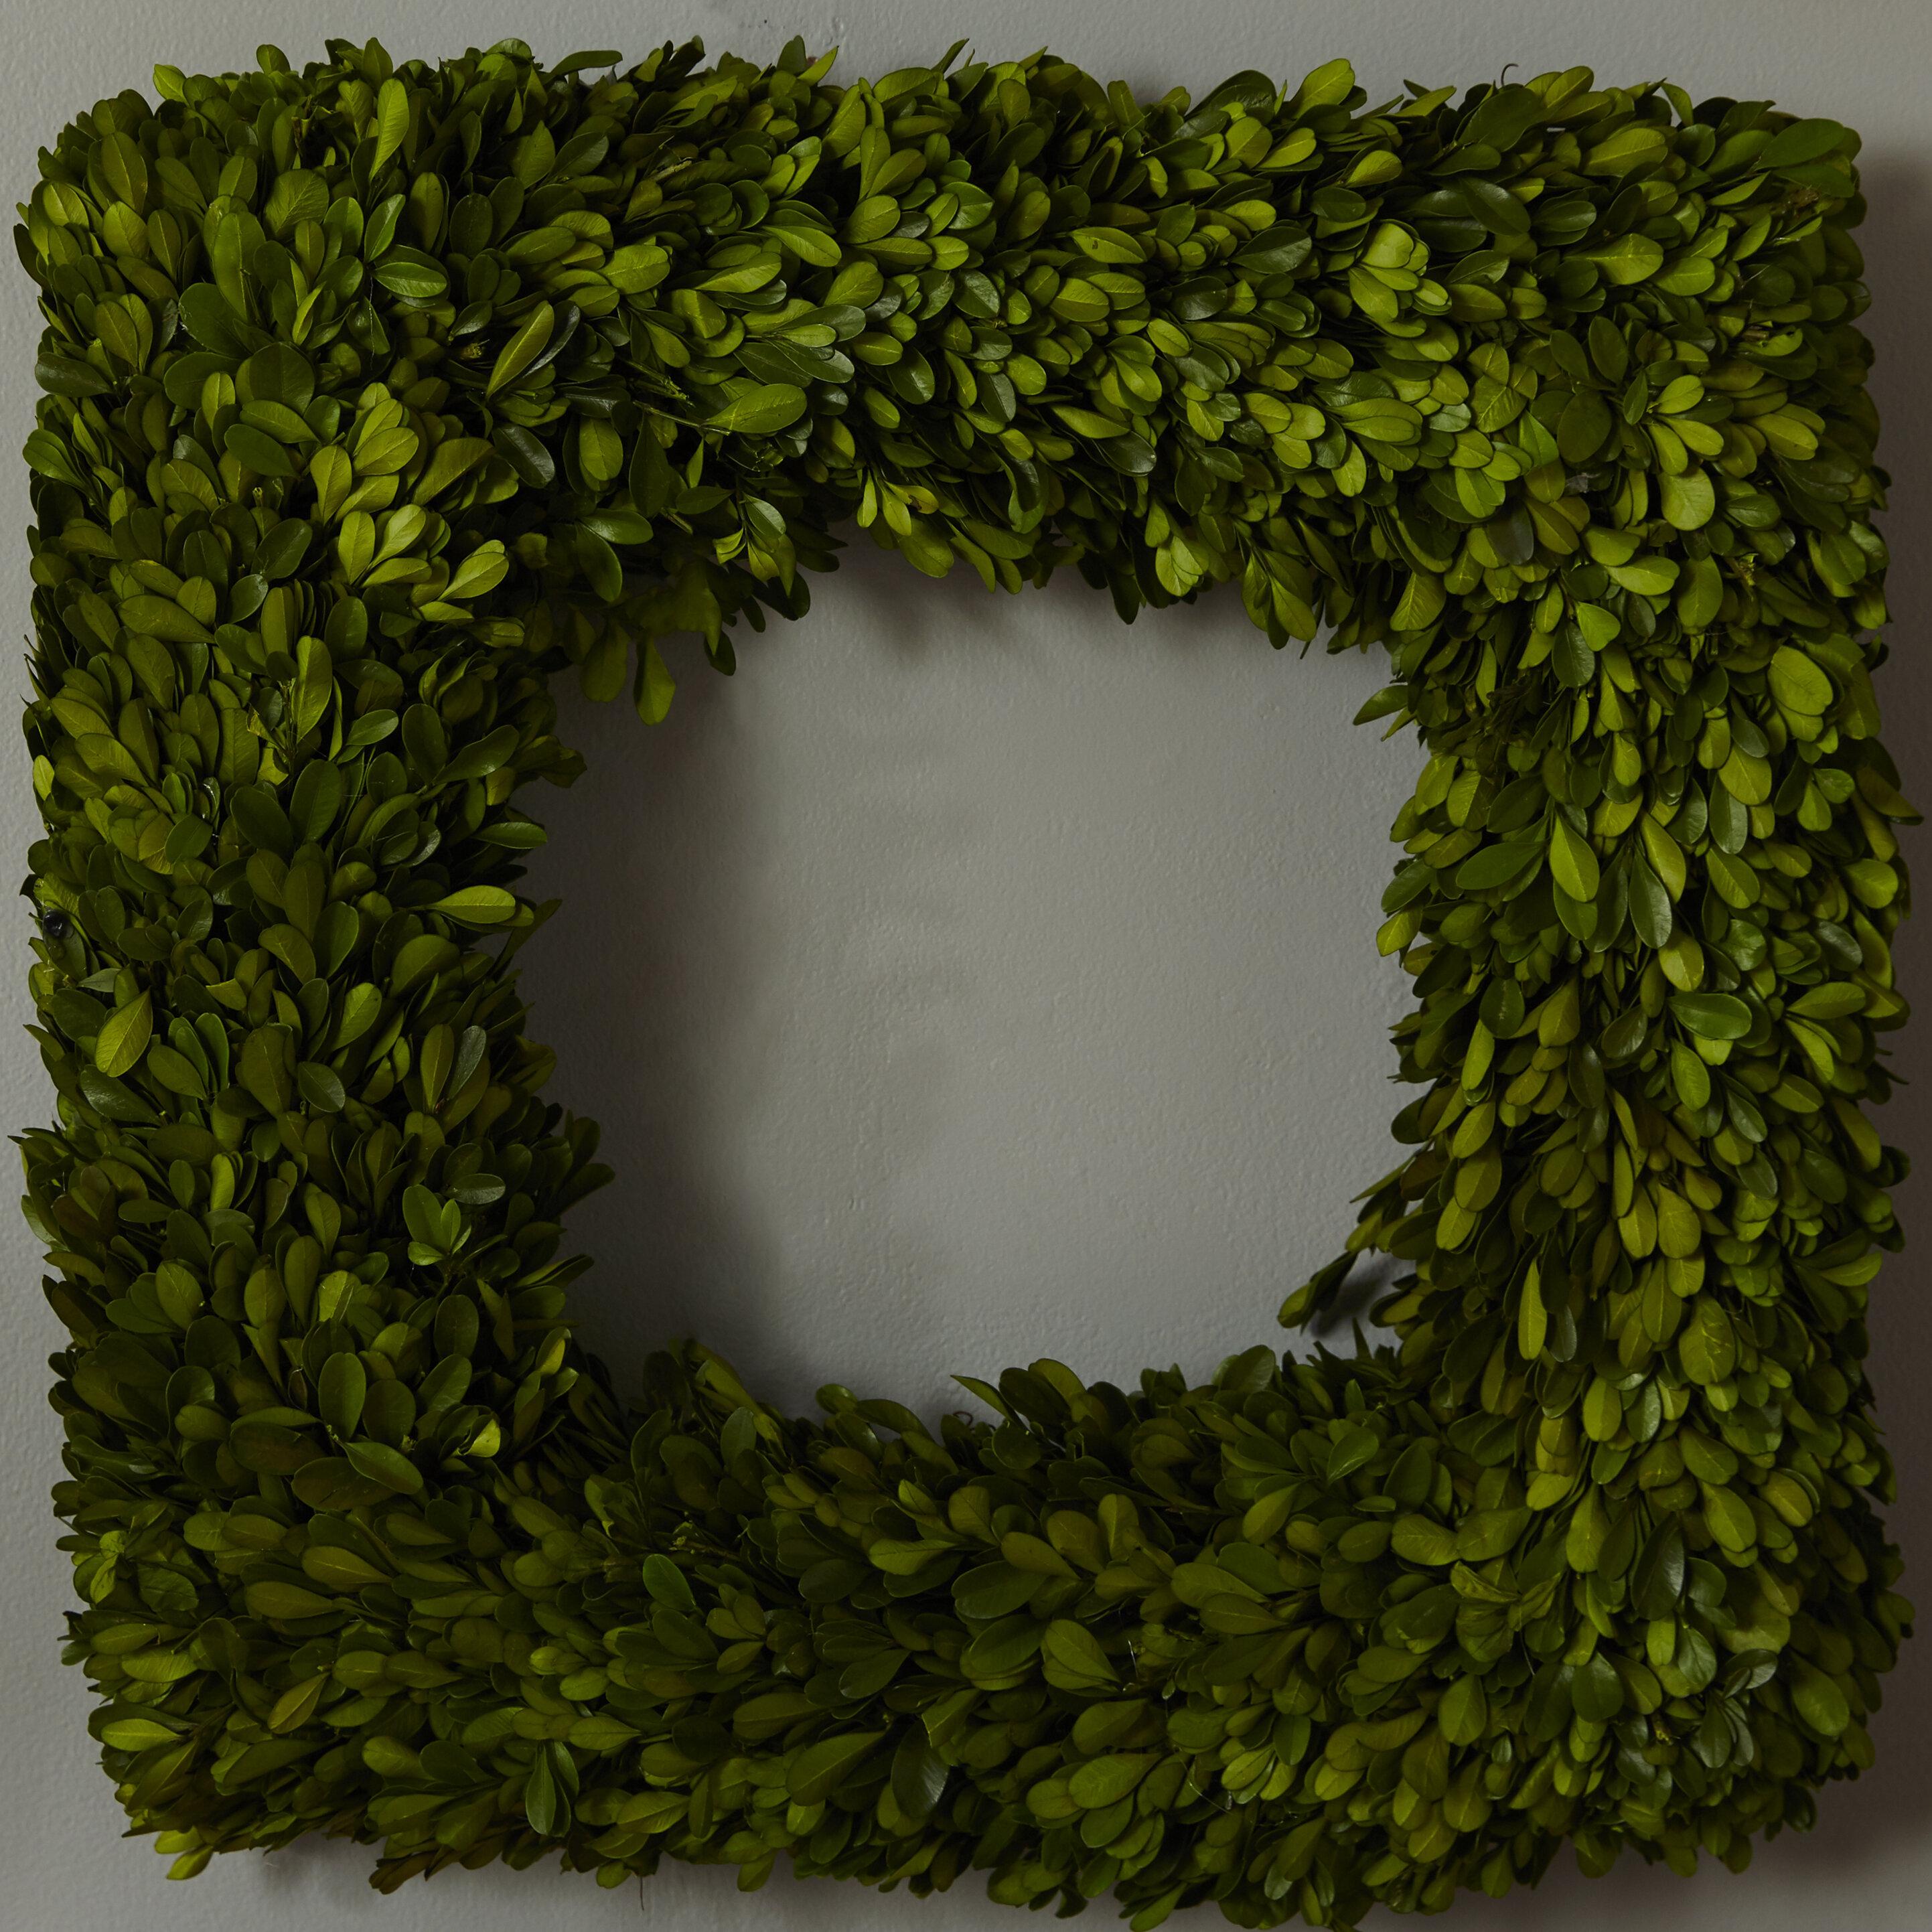 Boxwood Wreath-Faux Boxwood Wreath-Square Boxwood Wreath-Year Round Wreath-Square Wreath-Green Wreath-Modern Wreath-Housewarming Gift